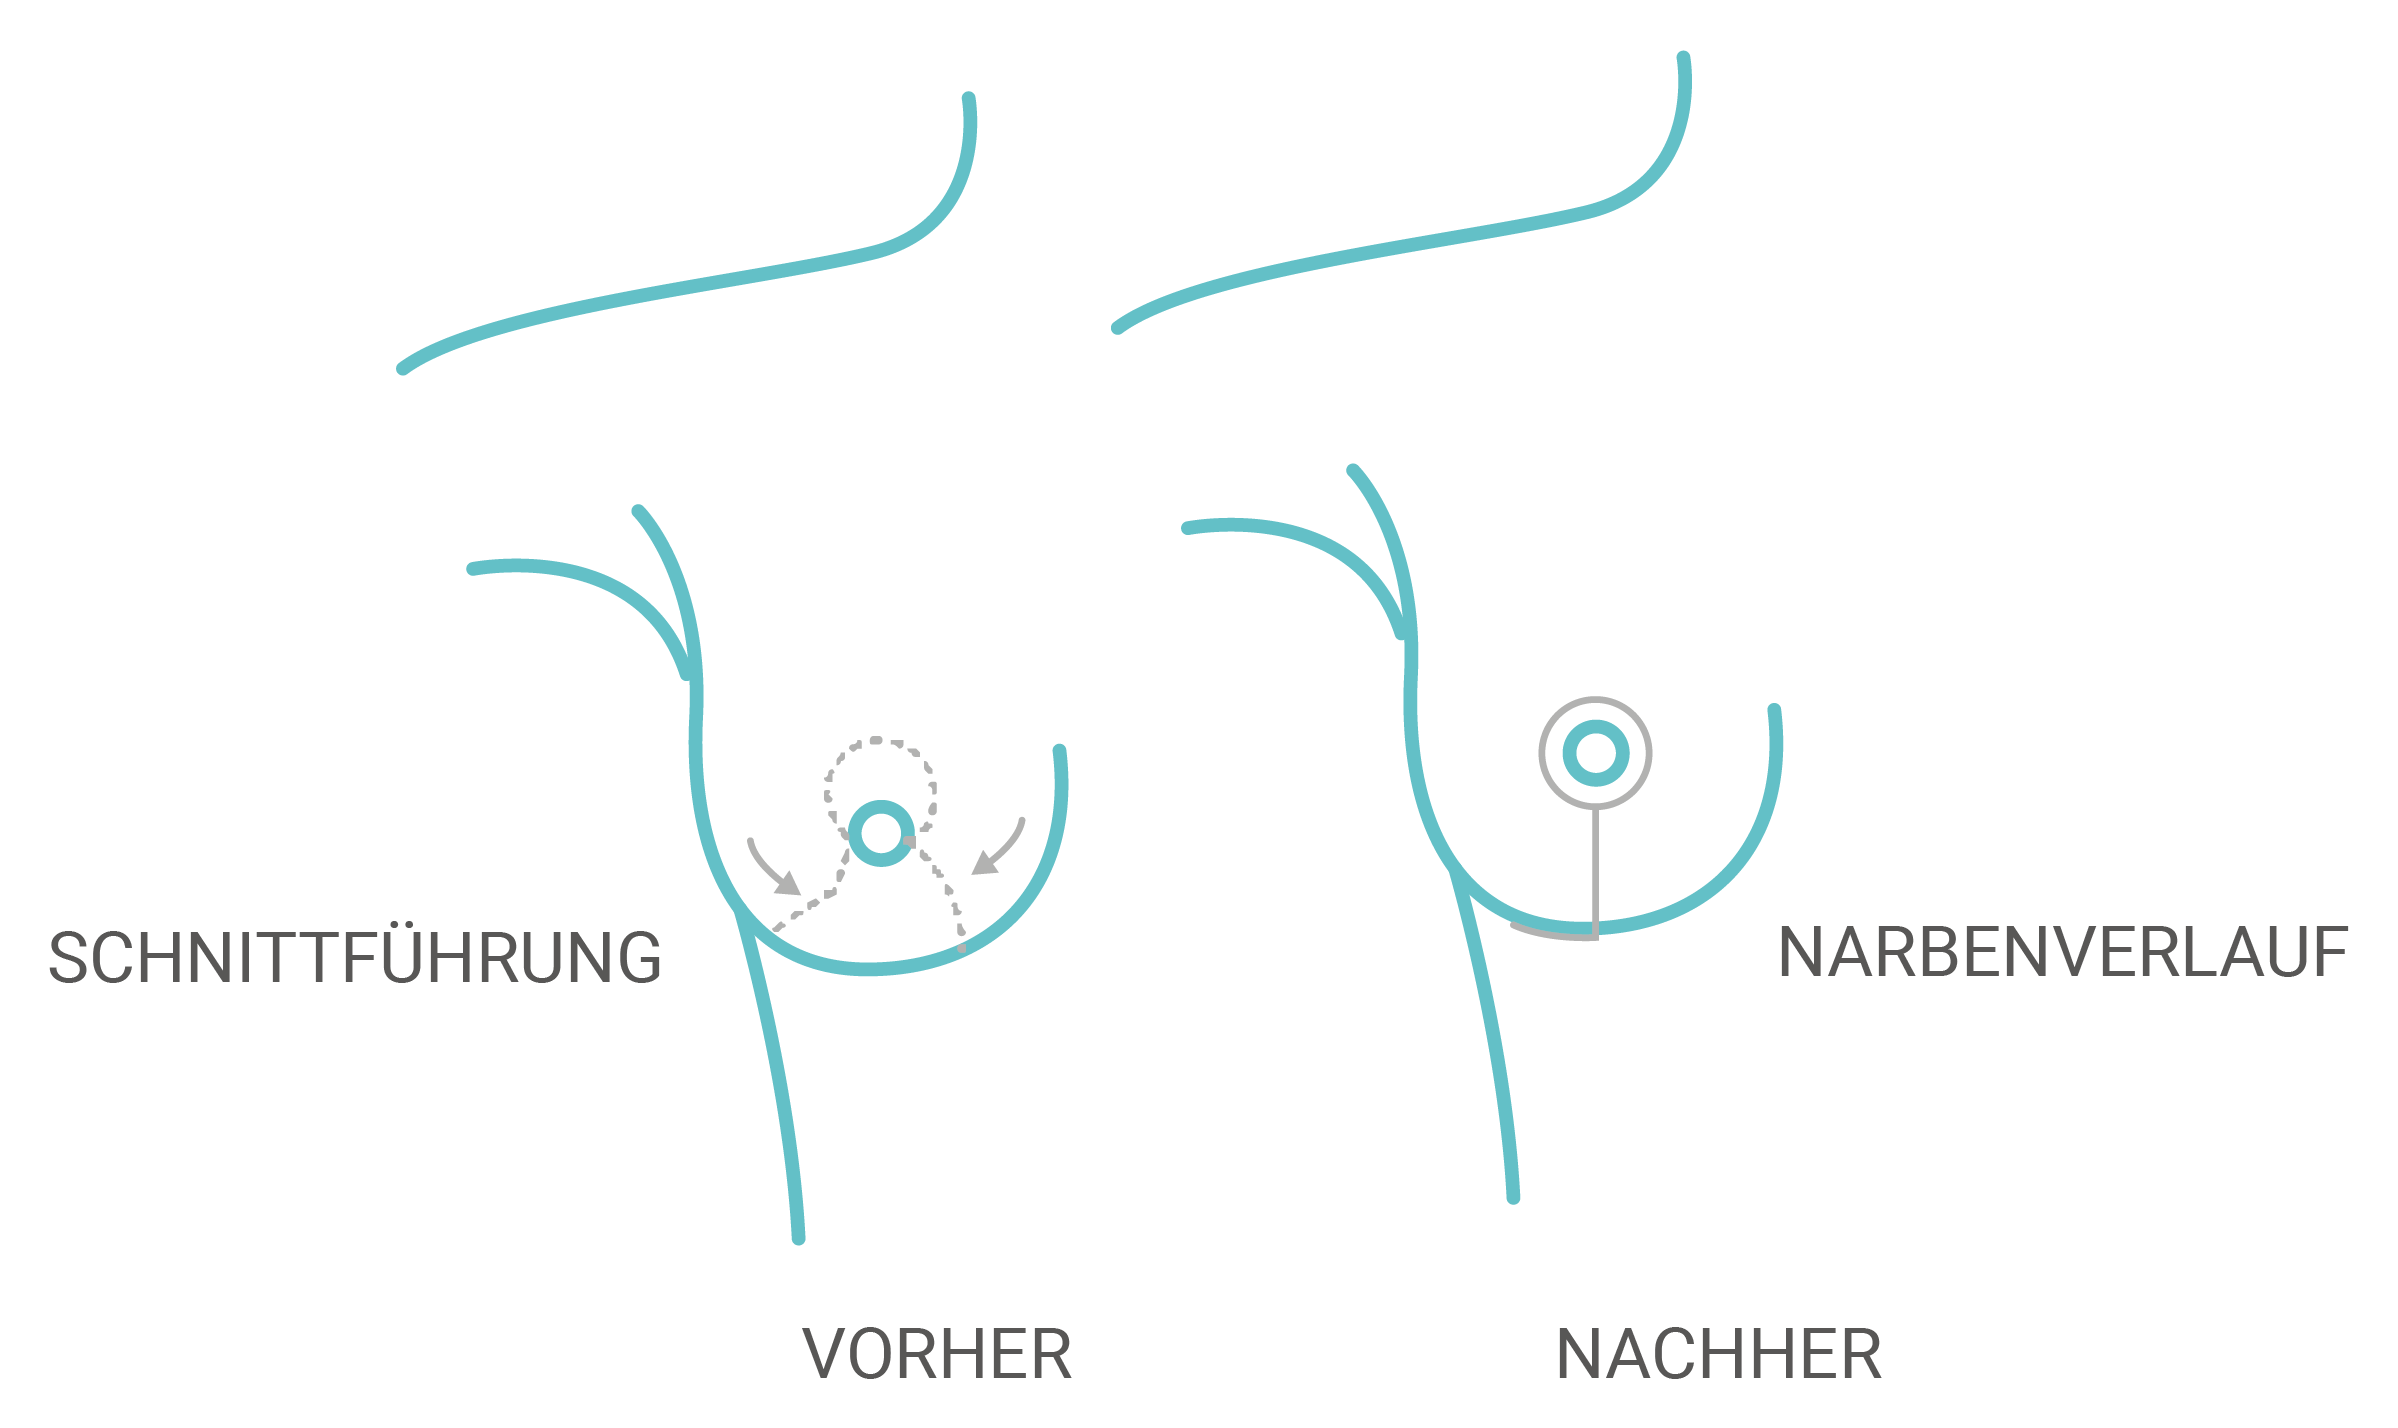 L-Schnitt-Technik